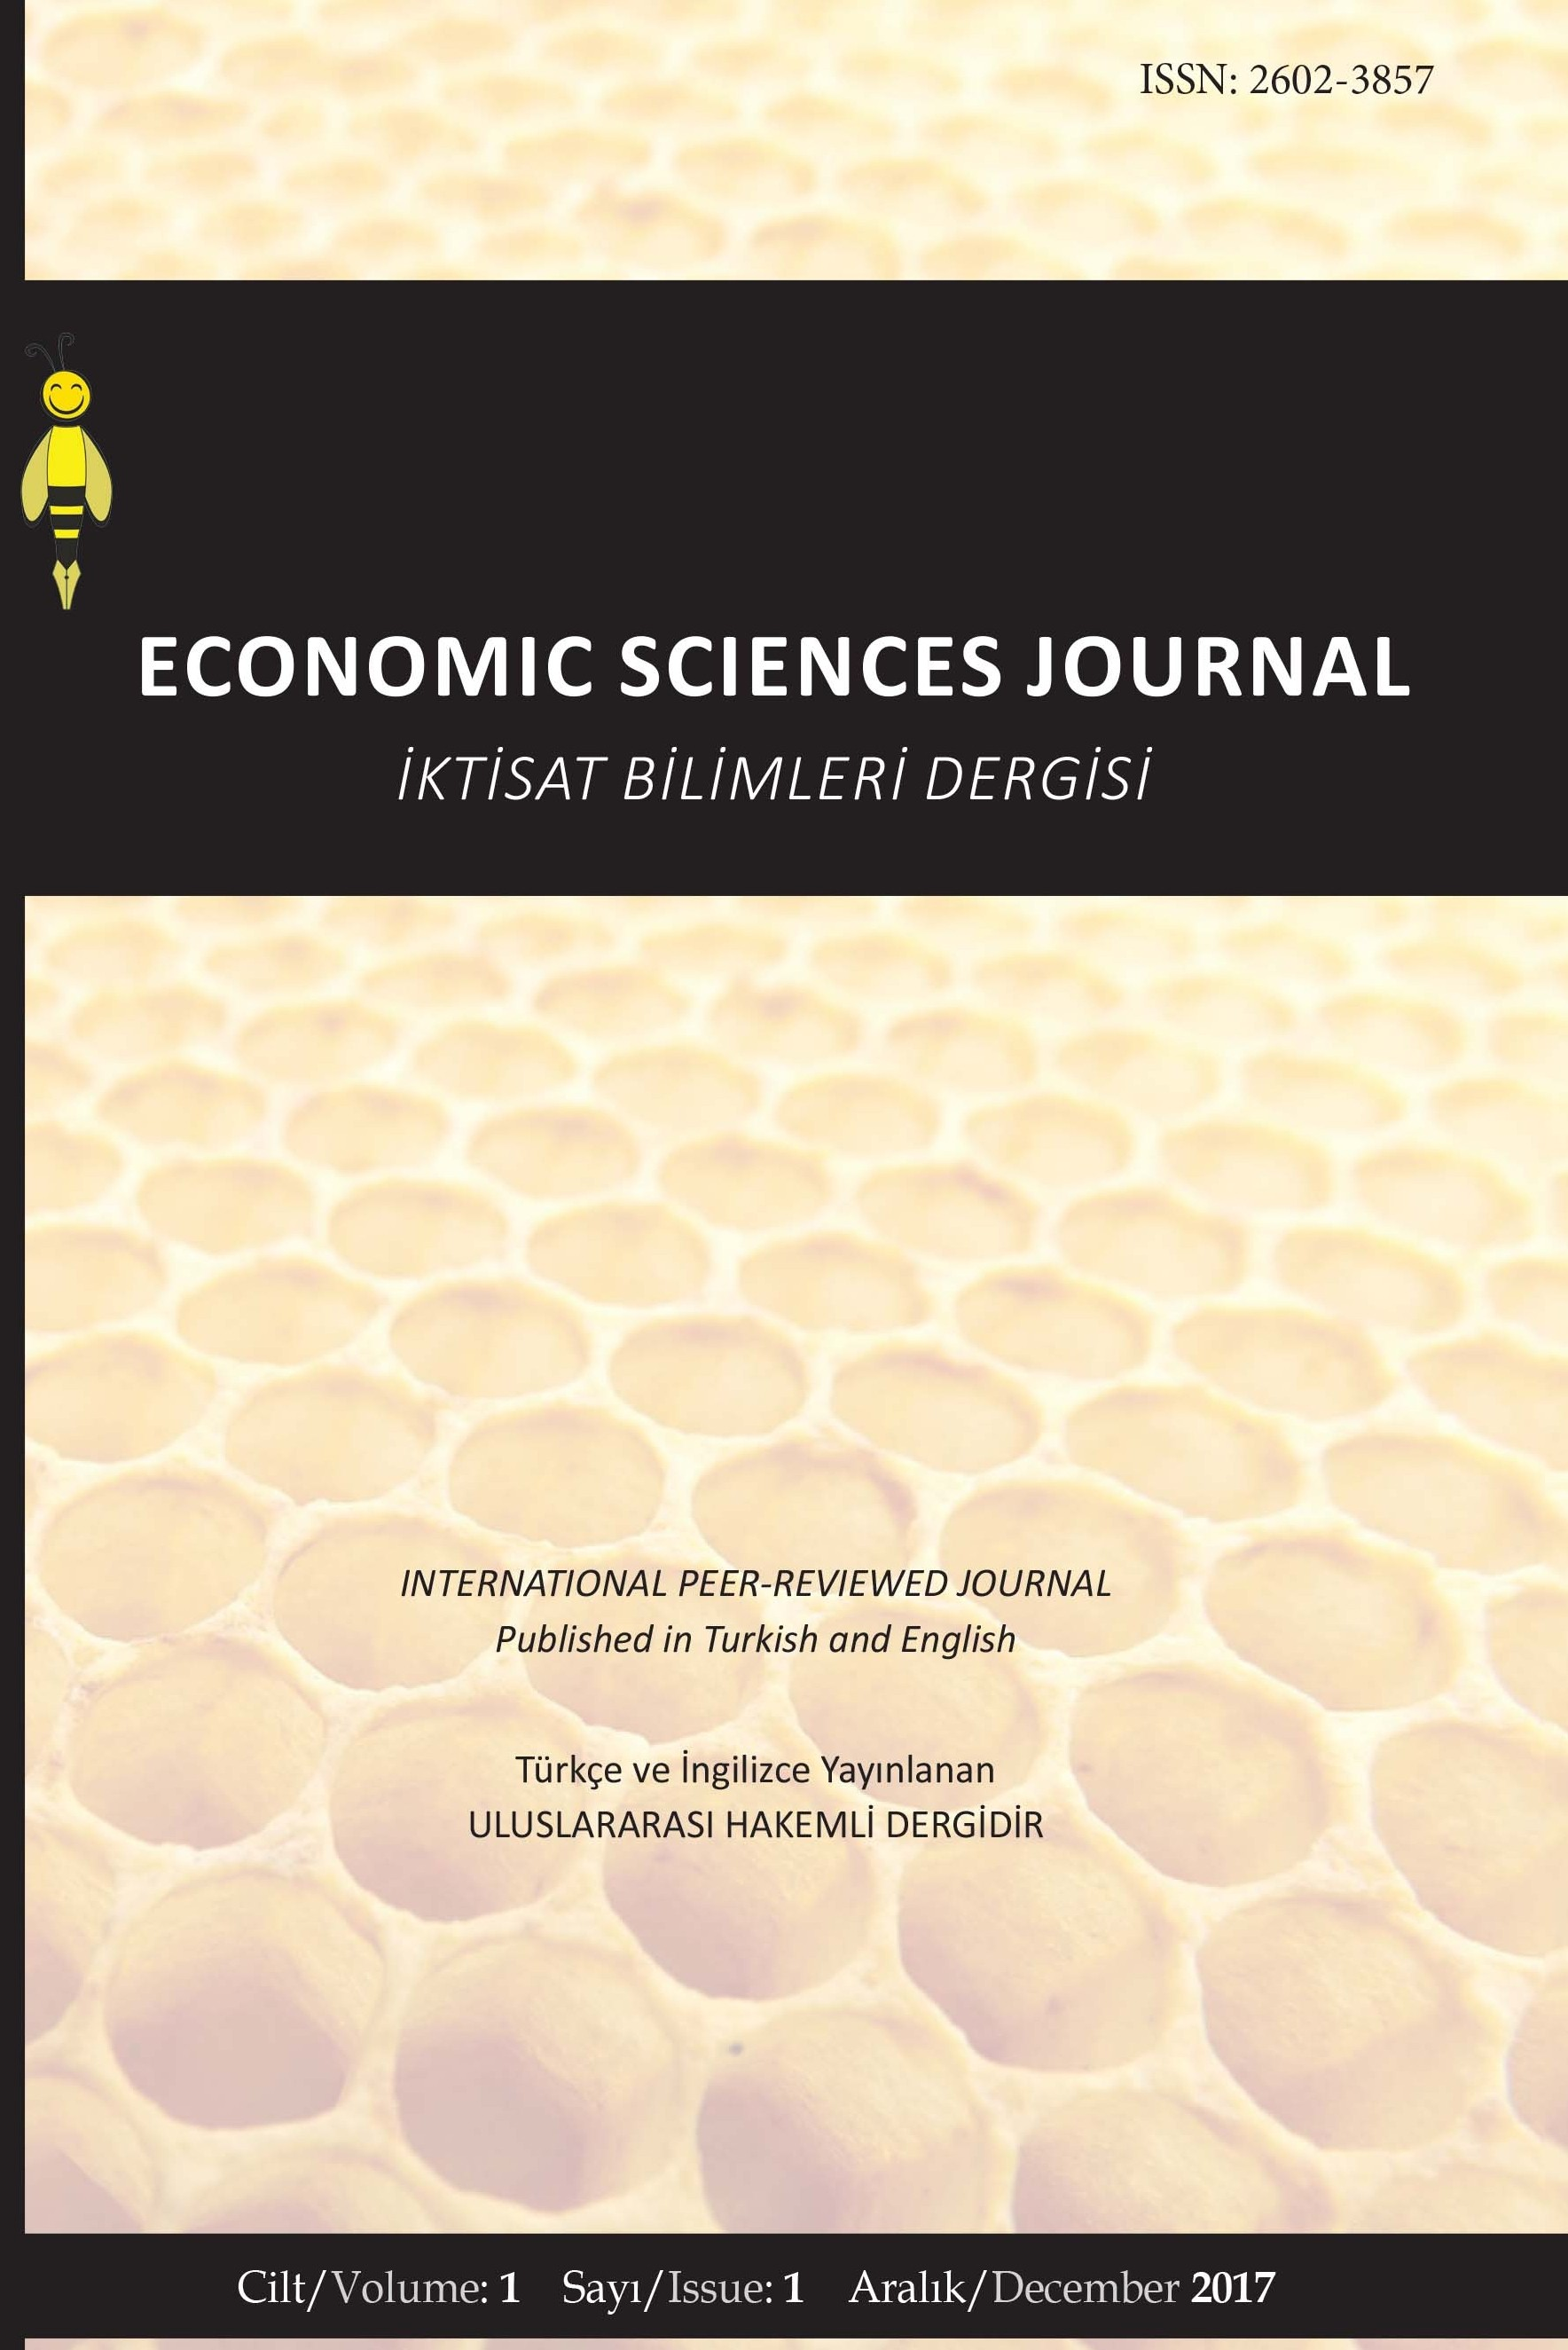 İktisat Bilimleri Dergisi